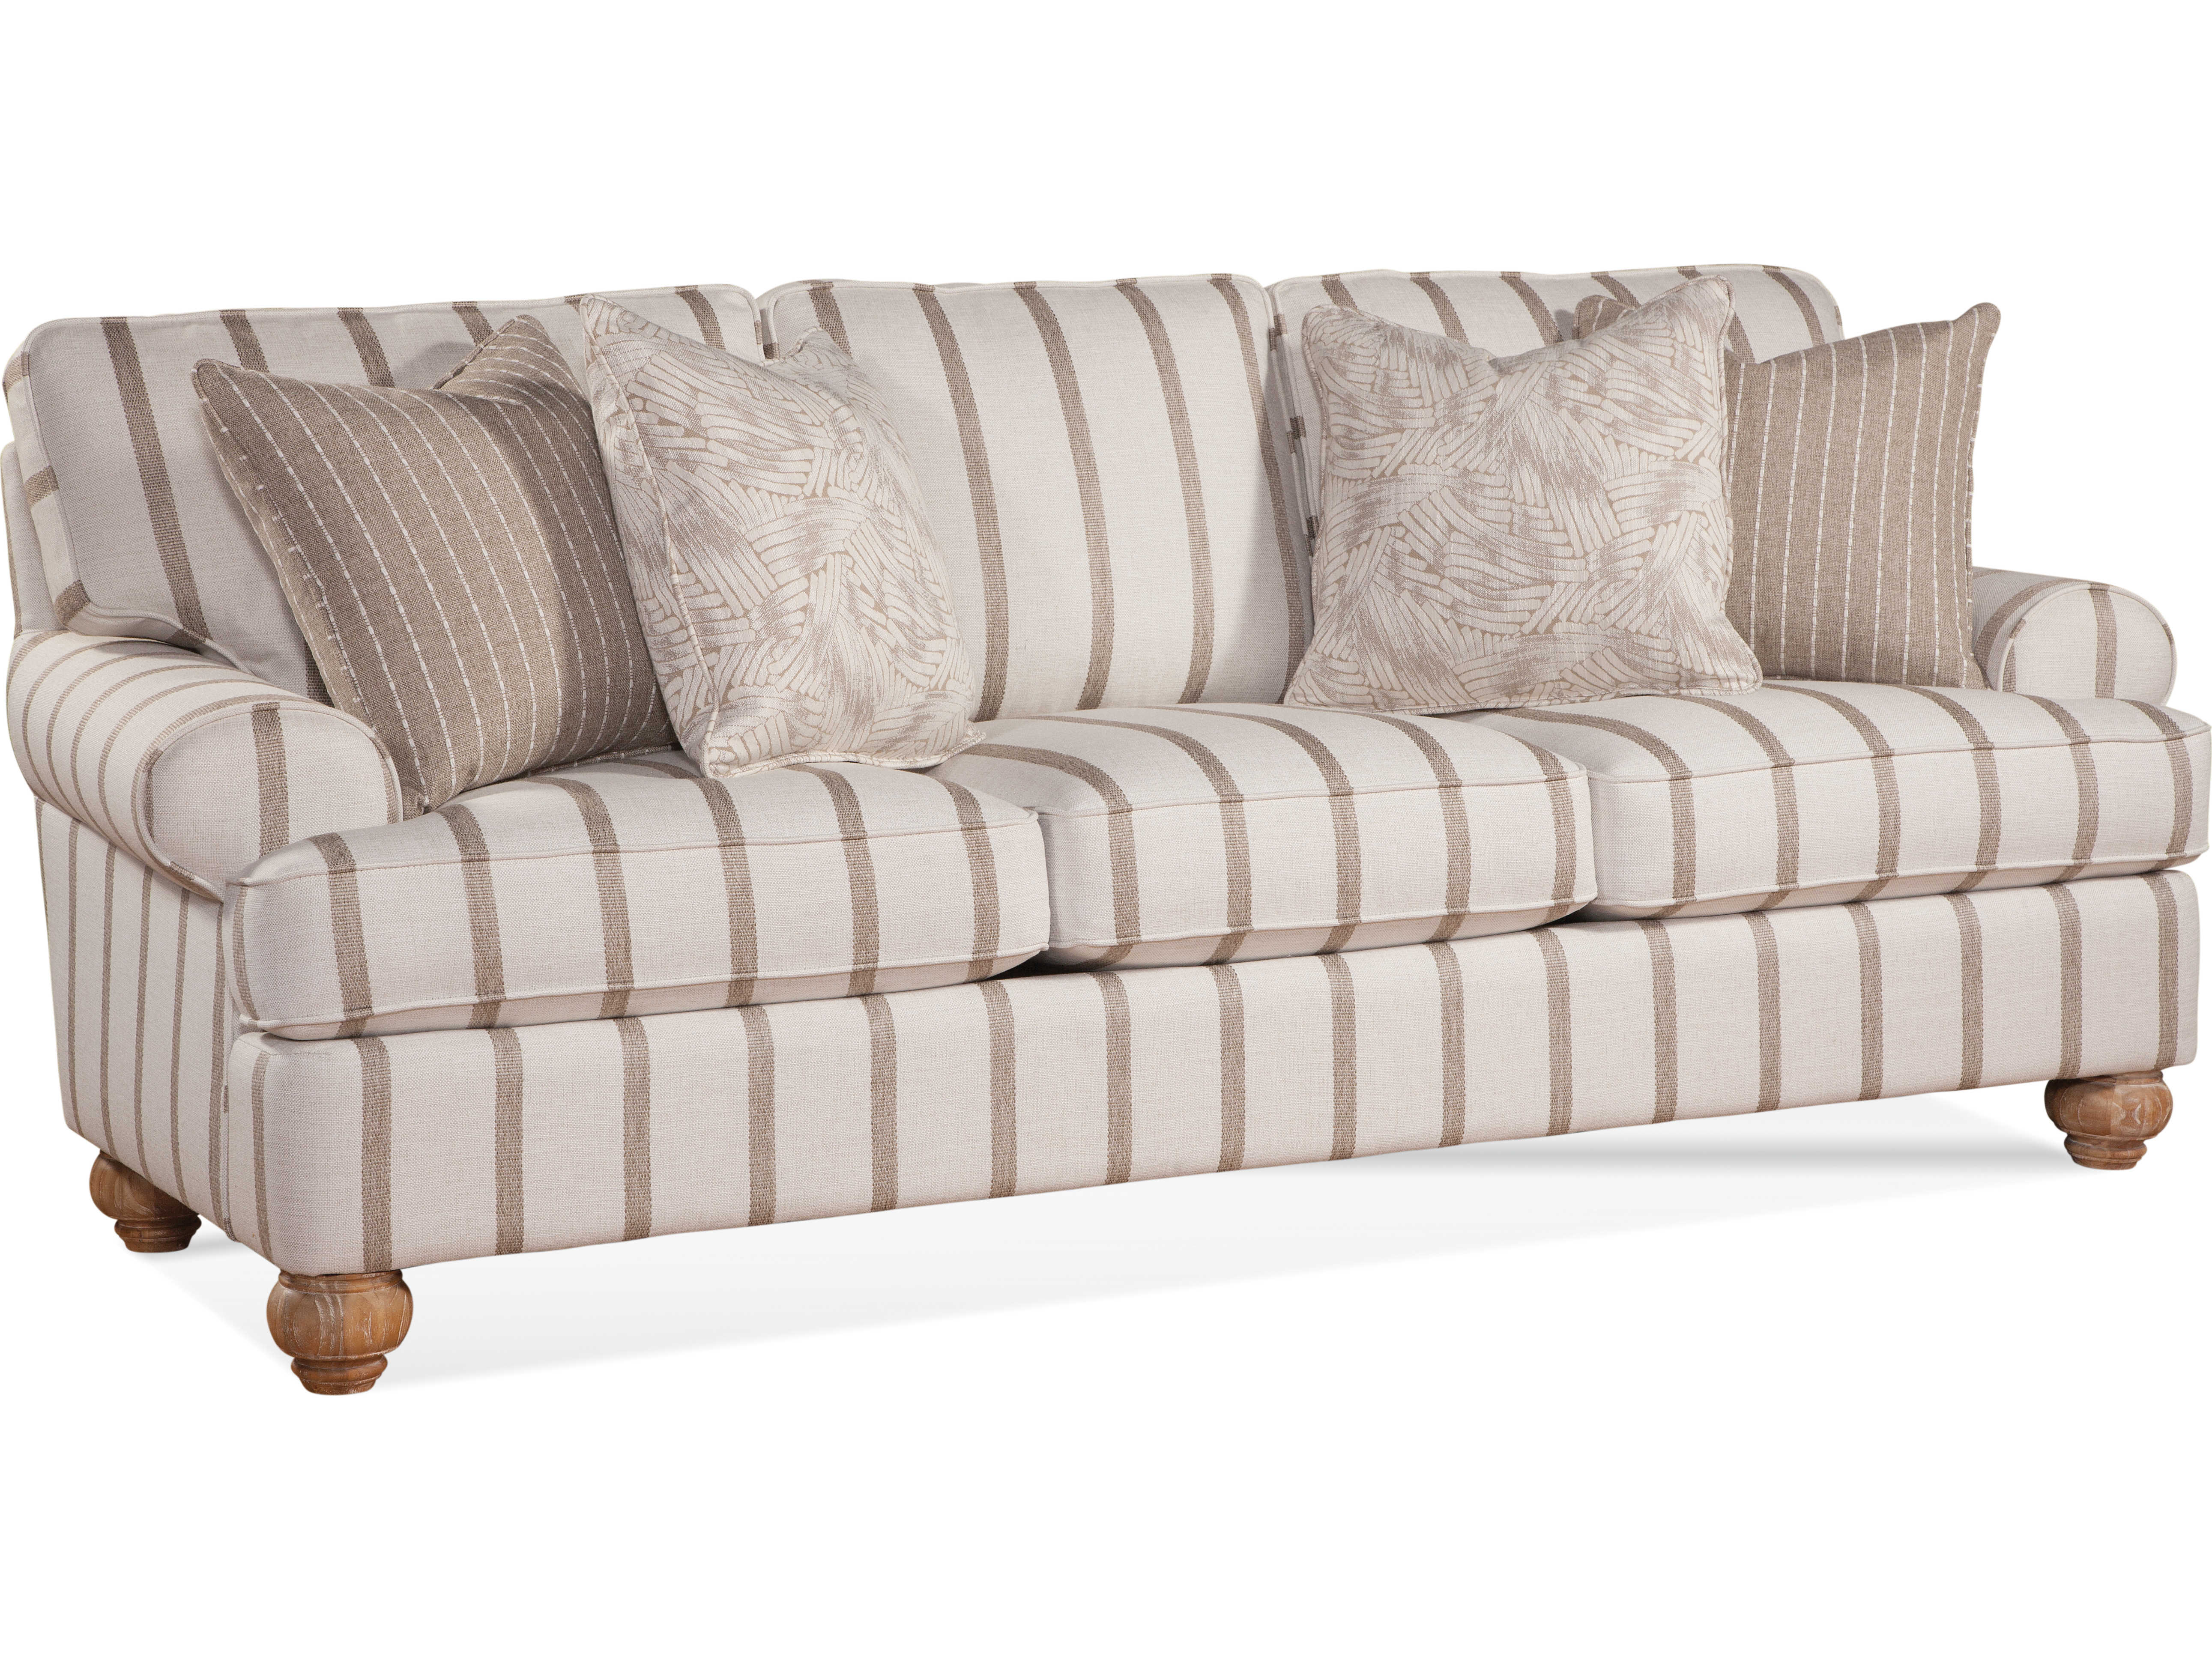 Braxton Culler Cimarron Sandalwood Hatteras Sofa Couch